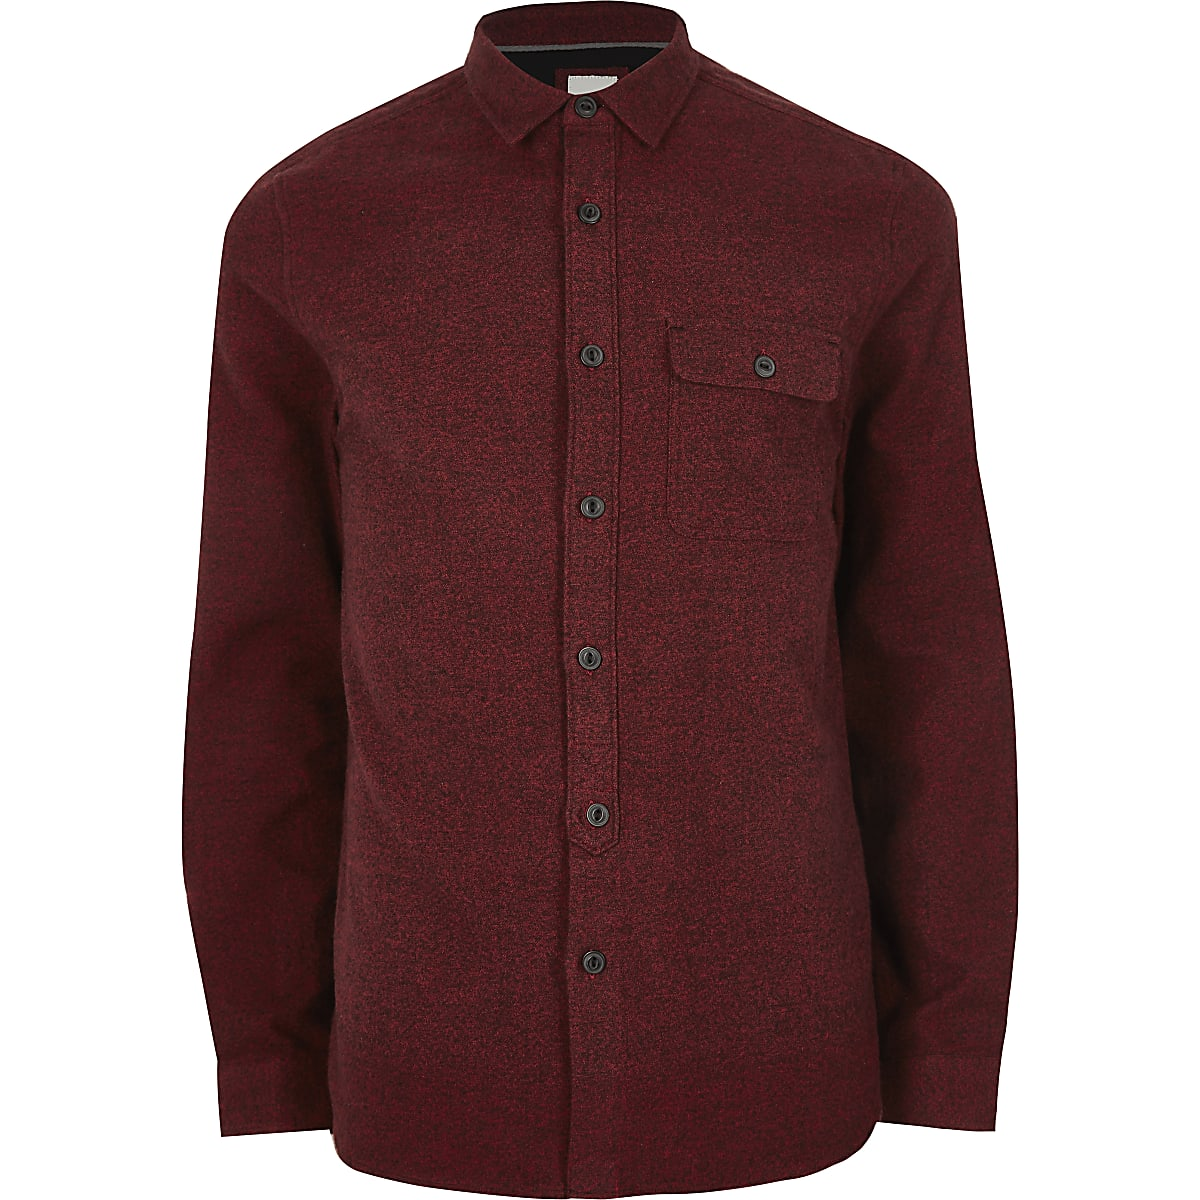 Dark red long sleeve chest pocket shirt